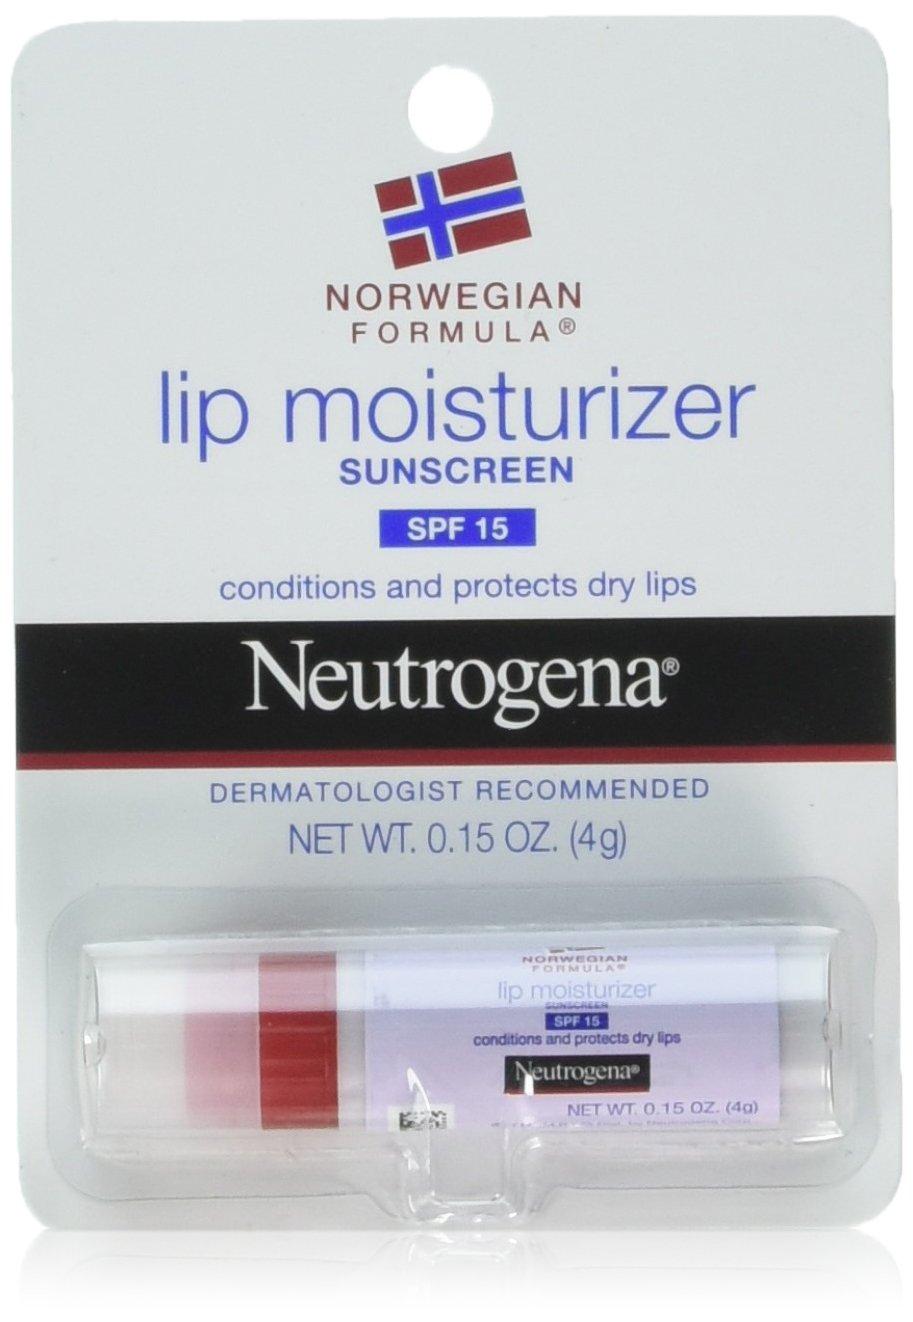 Neutrogena Norwegian Formula Lip Moisturizer With Sunscreen, Spf 15.15 Oz. (Pack of 2) Neu-9578